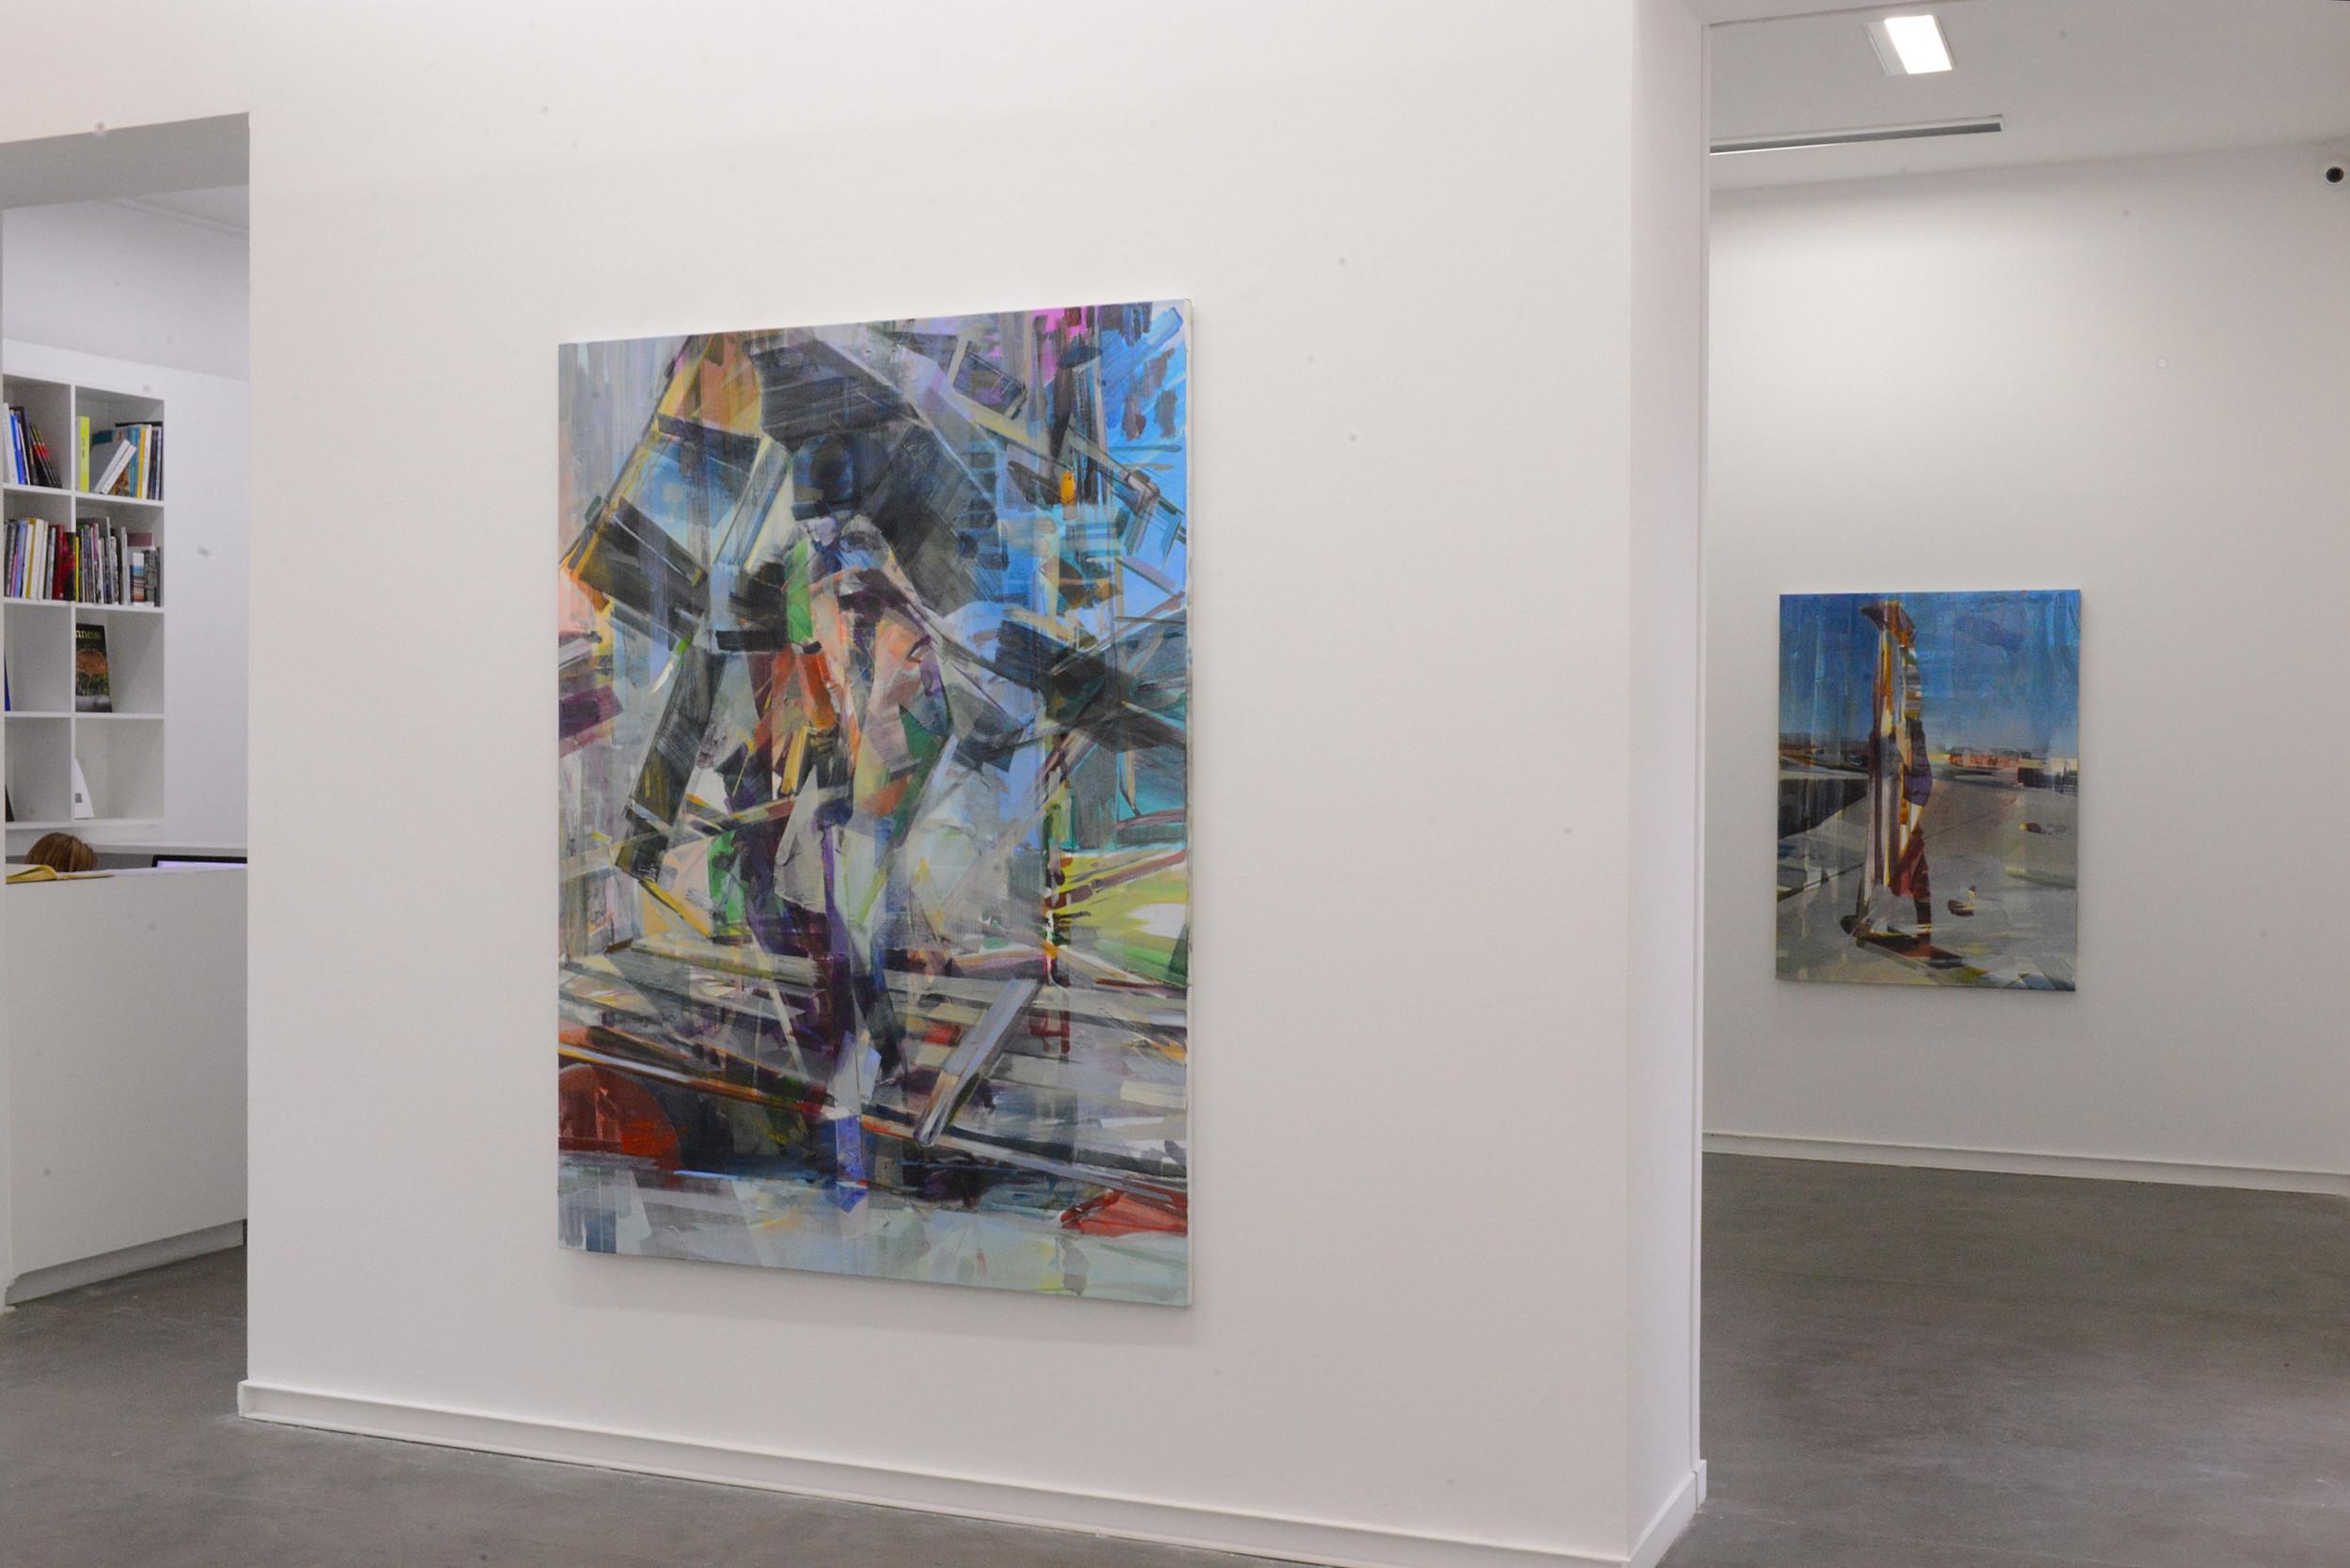 Slashers ,Mitterrand Gallery, Paris 2015